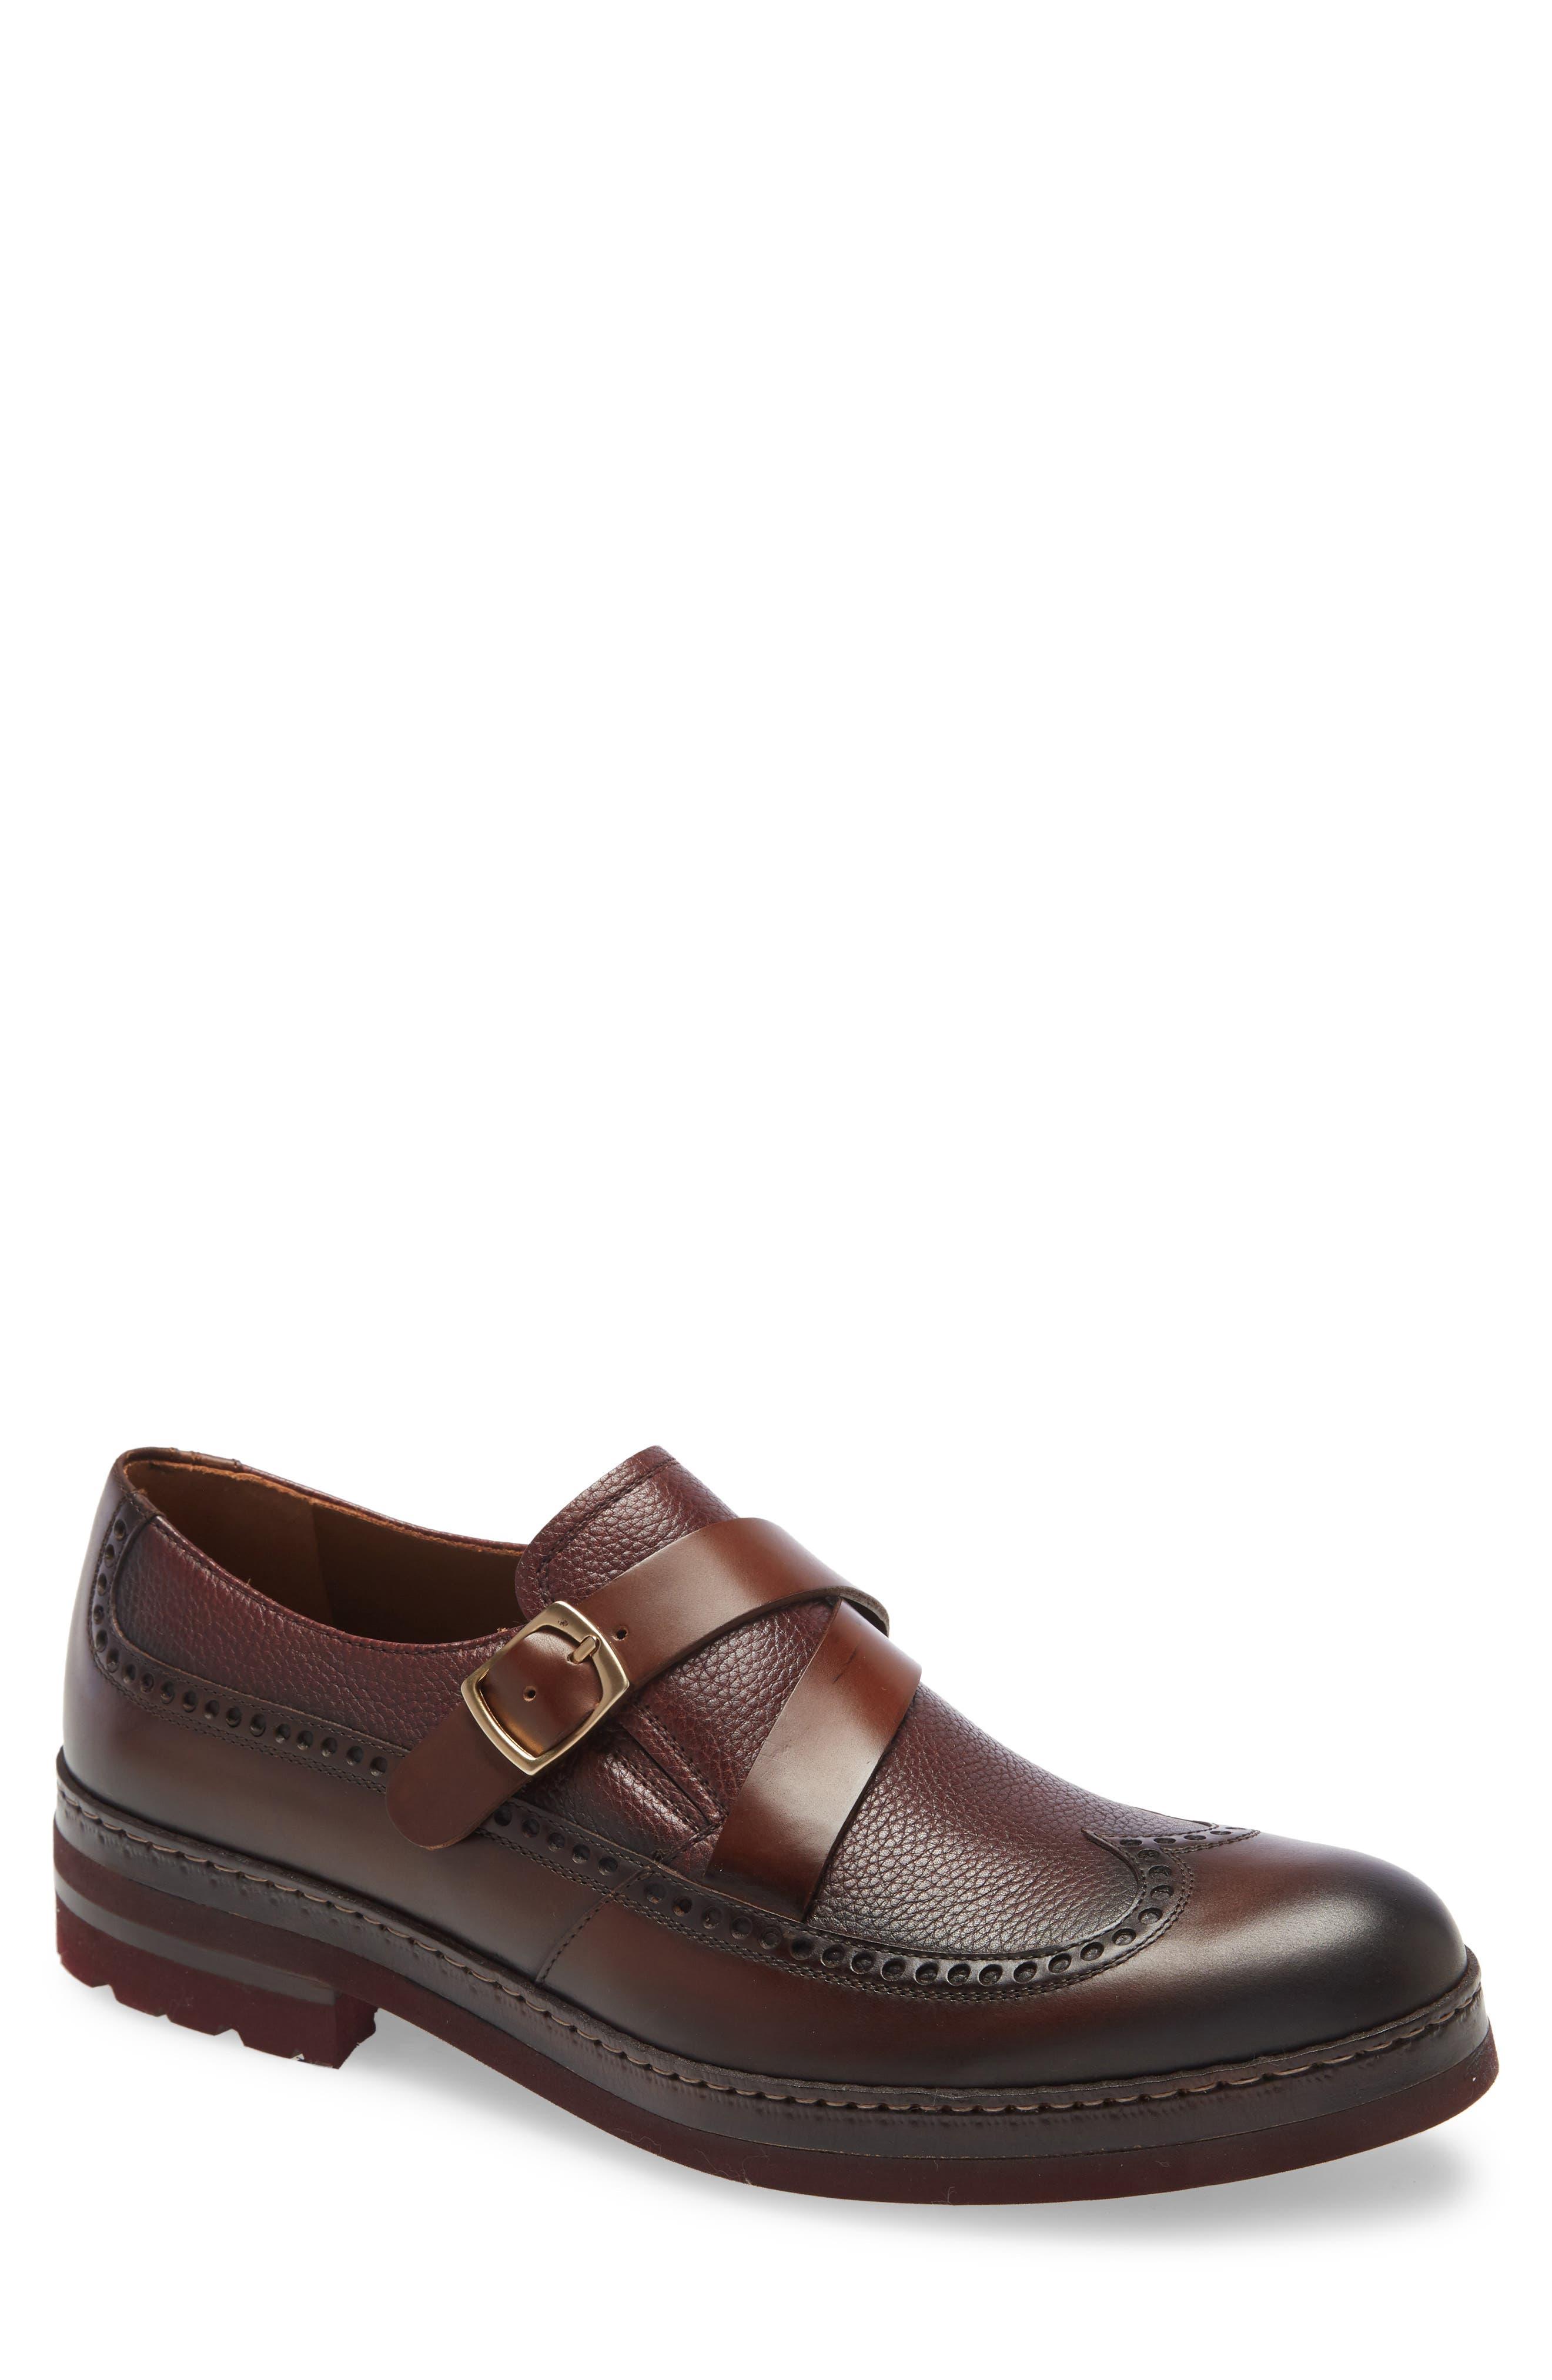 Fusion Monk Strap Shoe